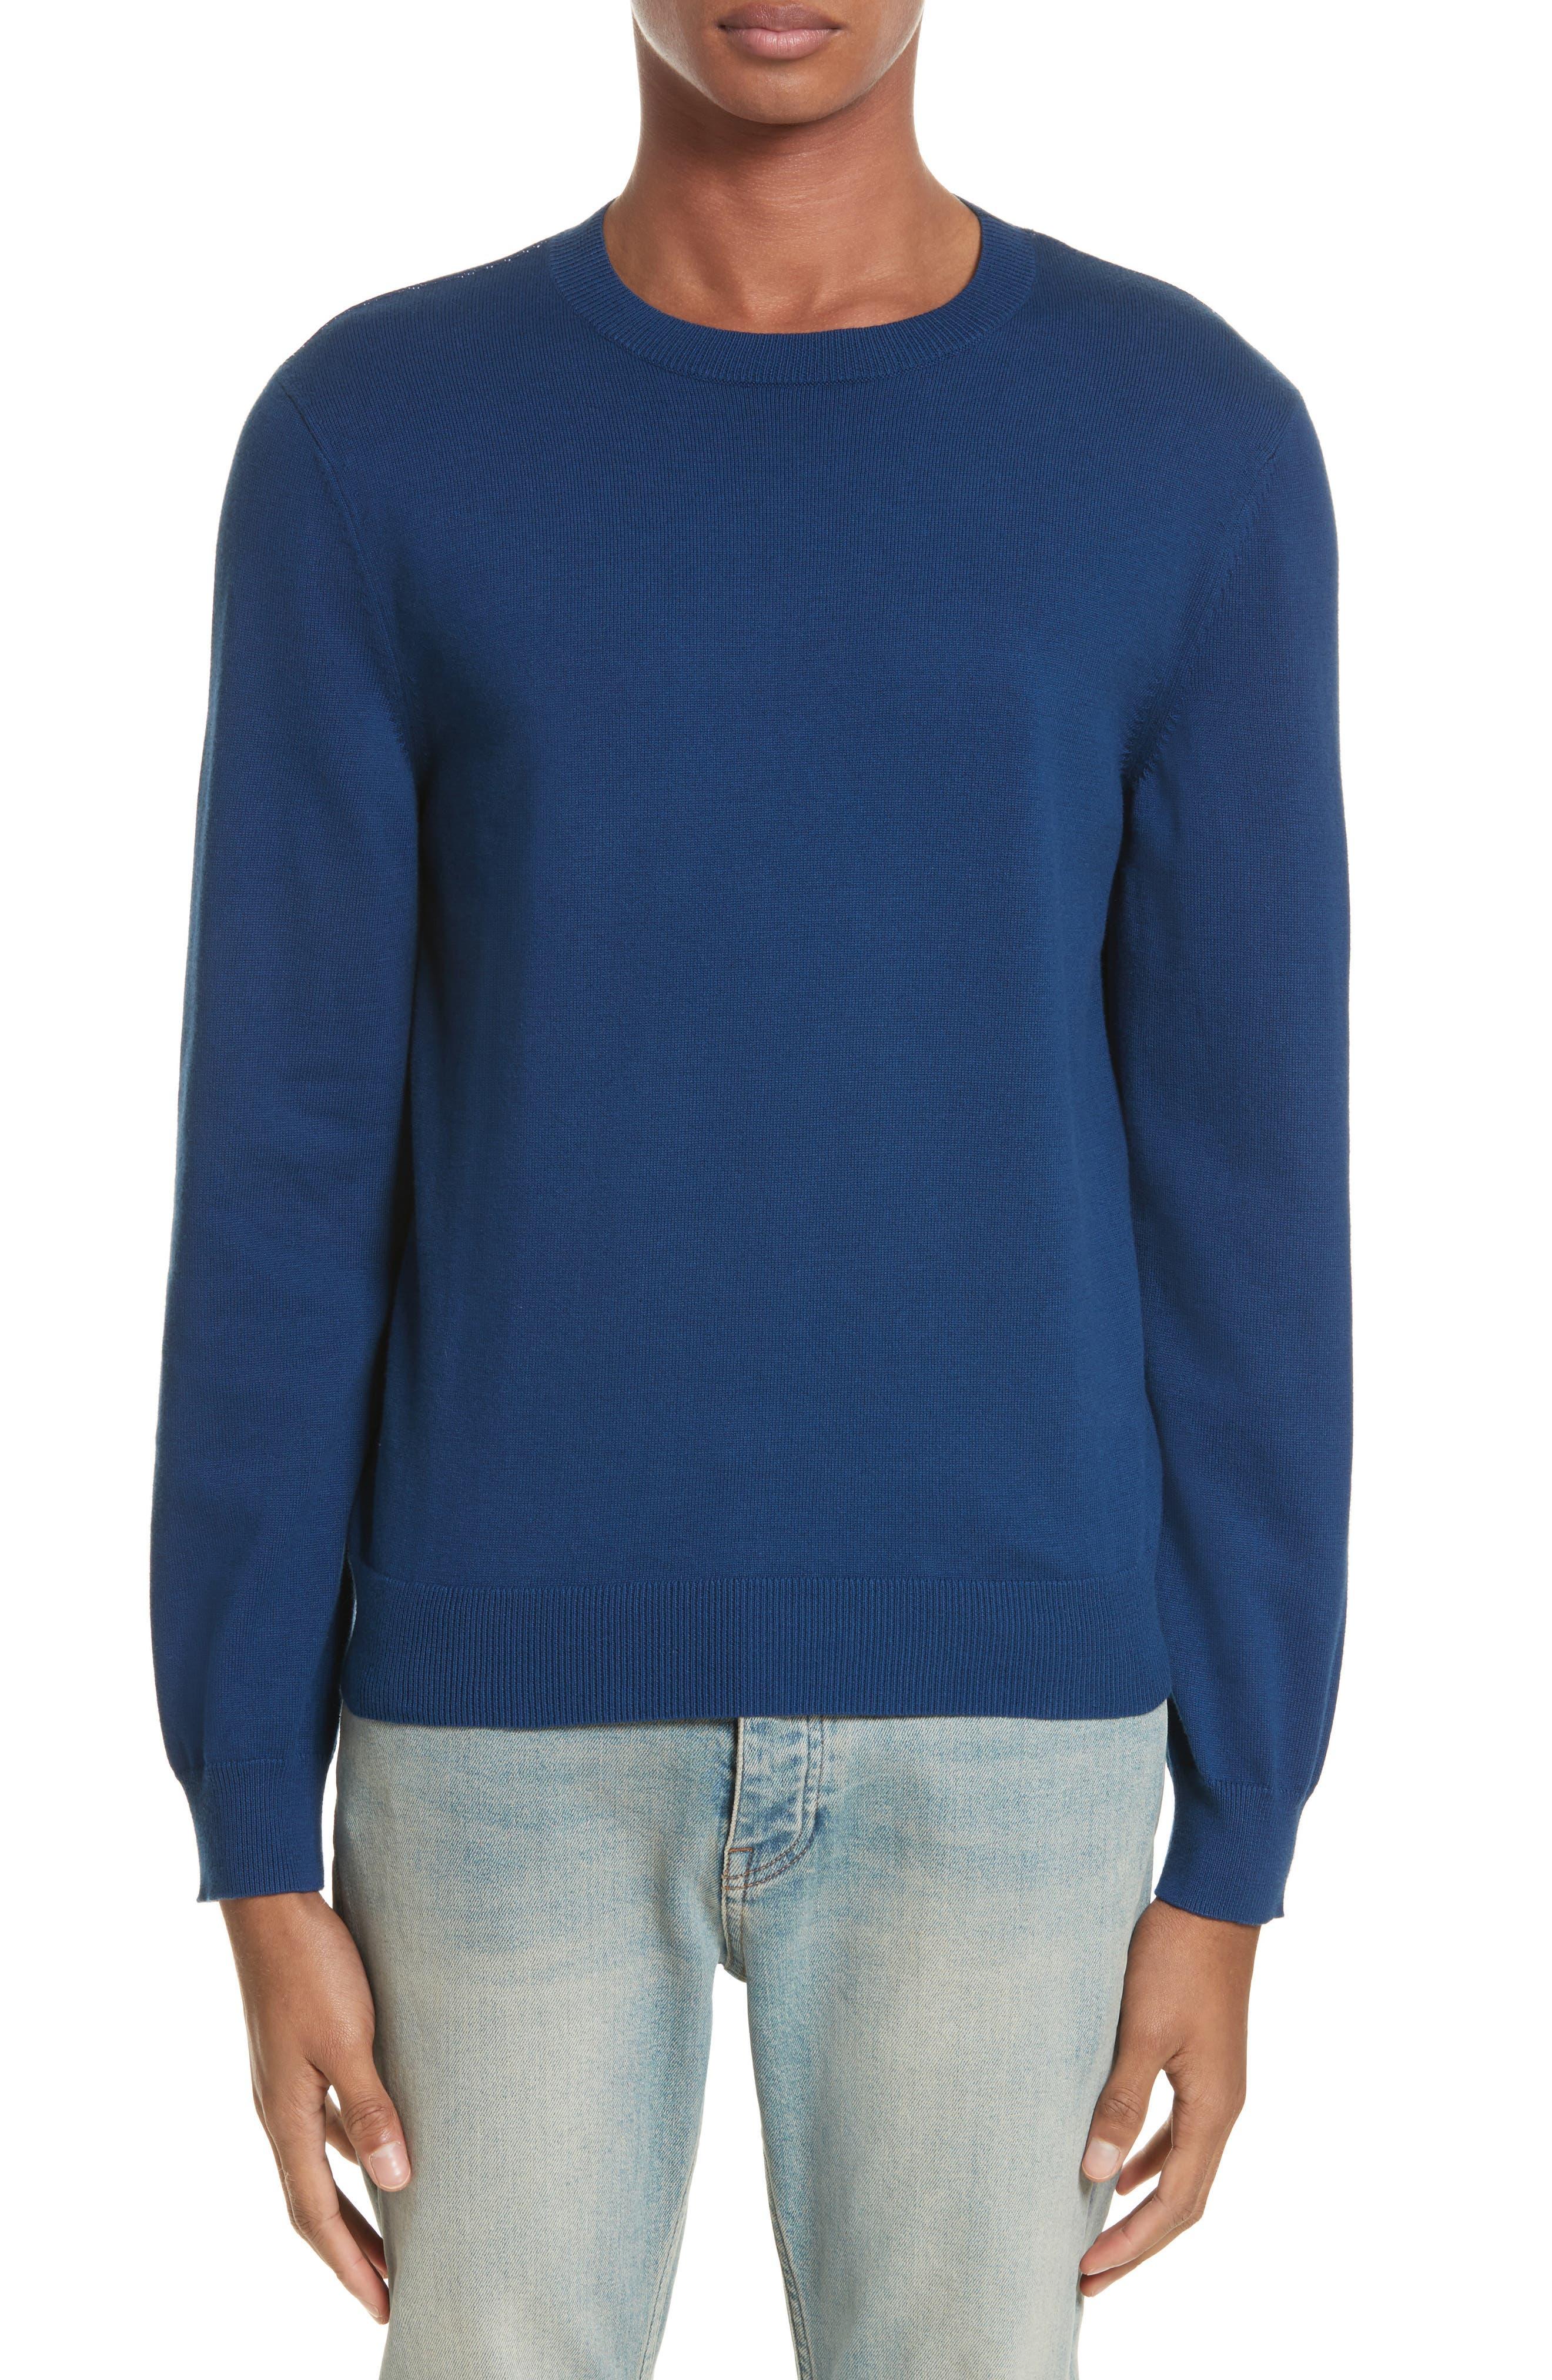 CIA Crewneck Sweater,                             Main thumbnail 1, color,                             401